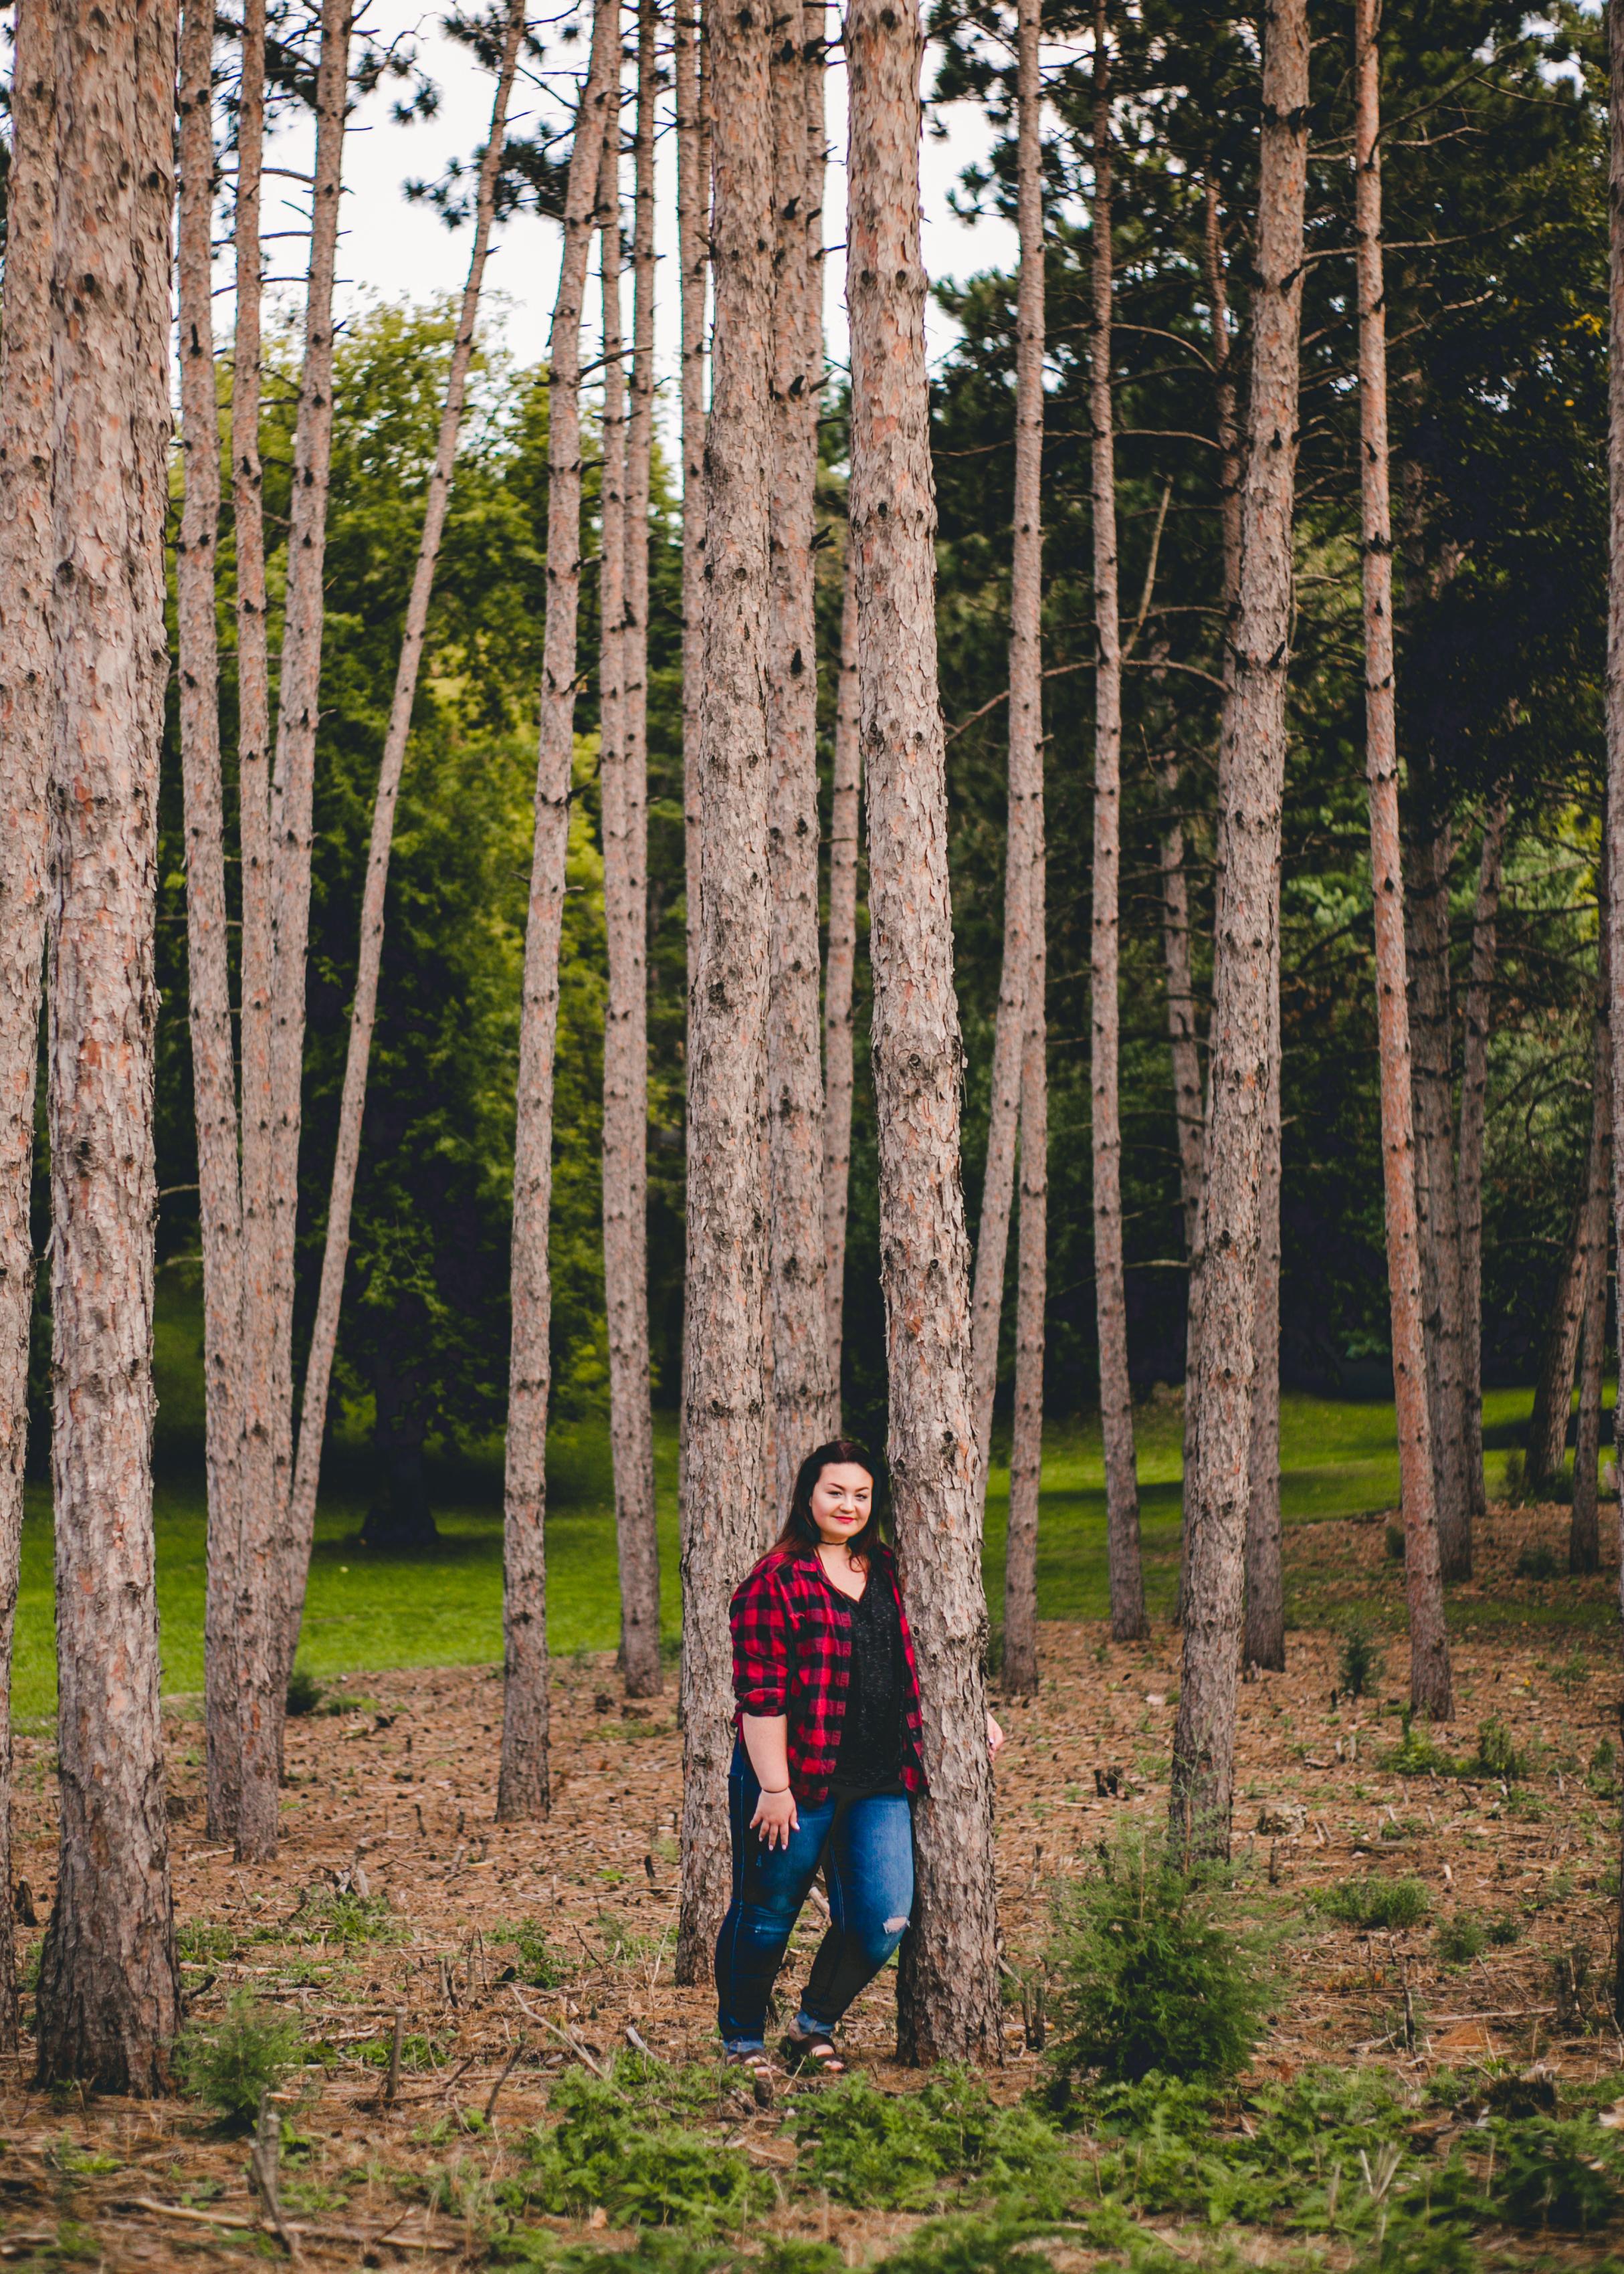 Senior in flannel posing against trees